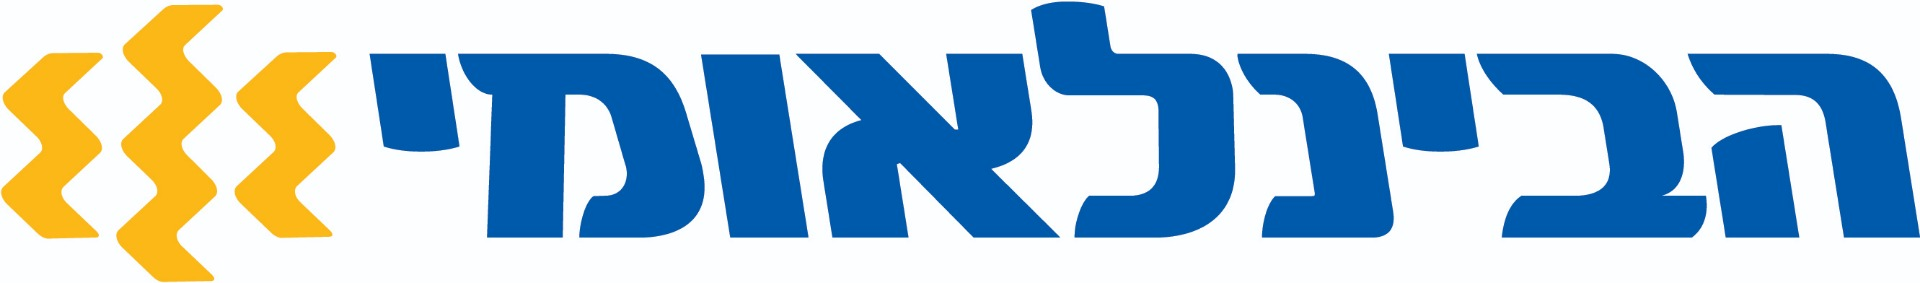 Partnership Company Logo HaBenleumi הבינלאומי